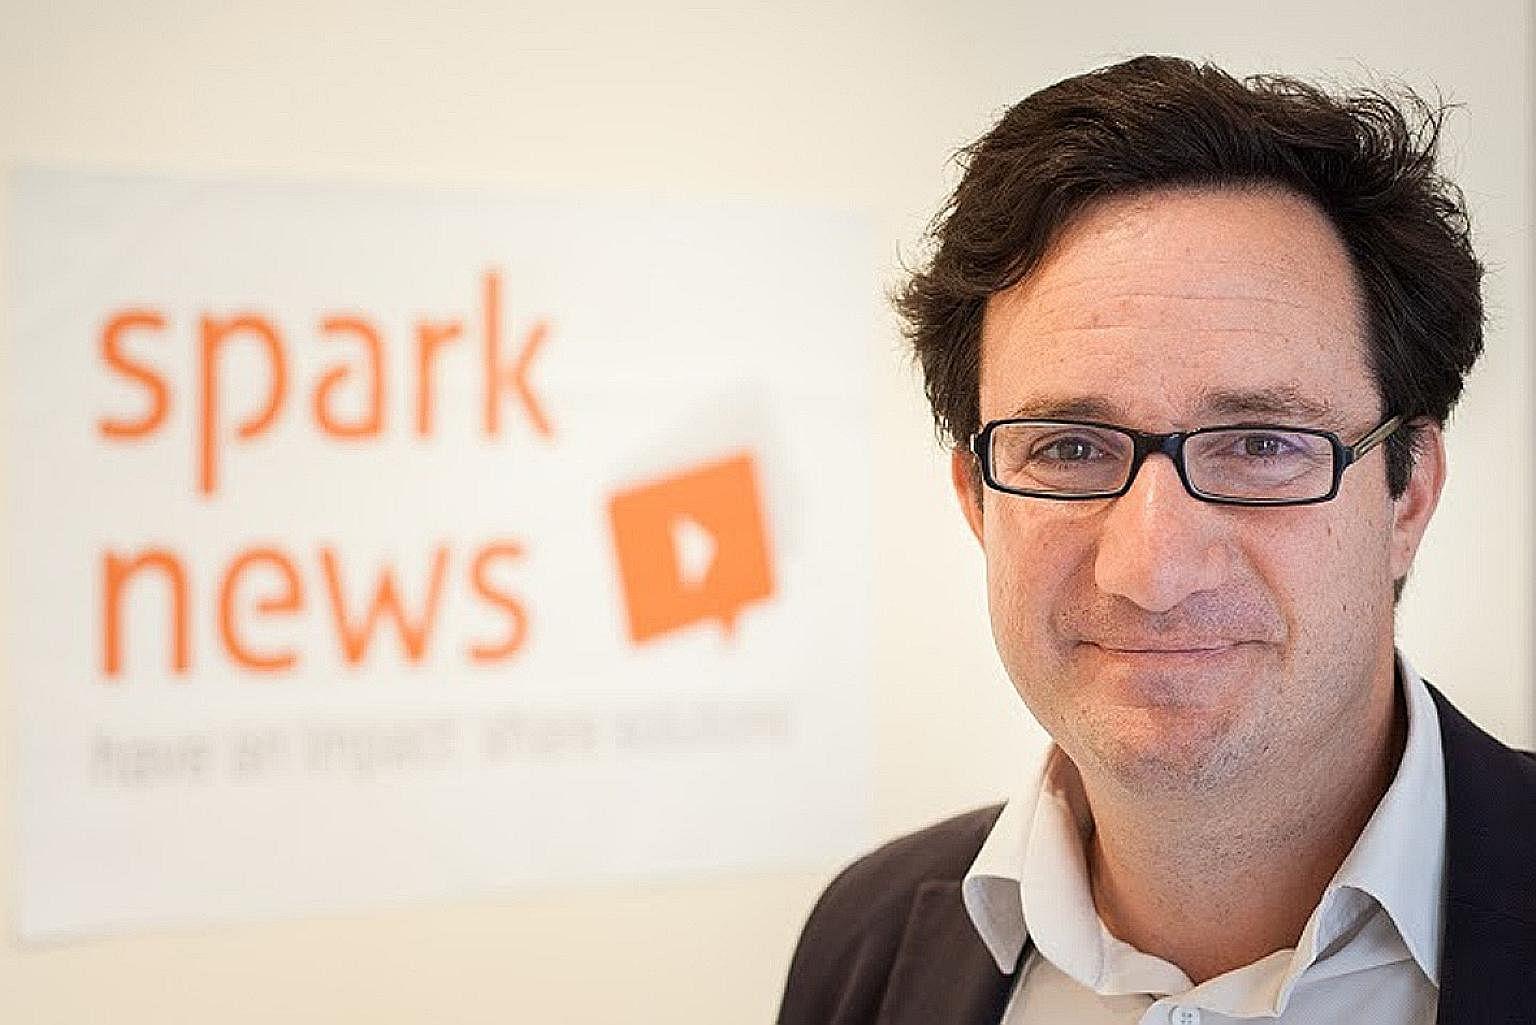 Christian de Boisredon Founder of Sparknews and Ashoka Fellow & the Sparknews Team